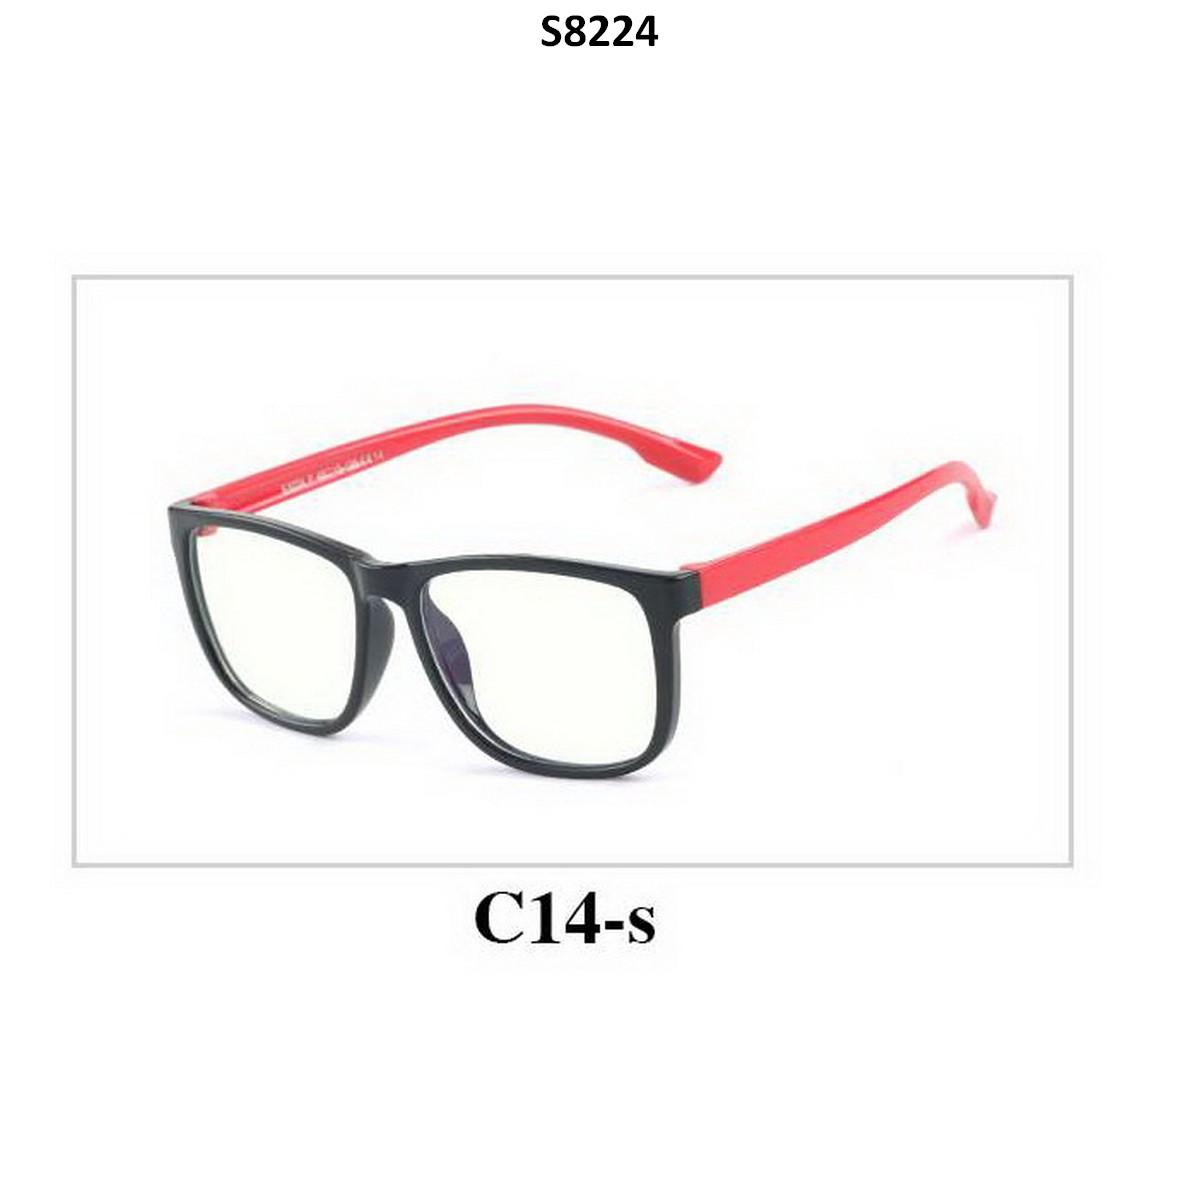 Kids Blue Light Blocker Computer Glasses Anti Blue Ray Eyeglasses S8224C14